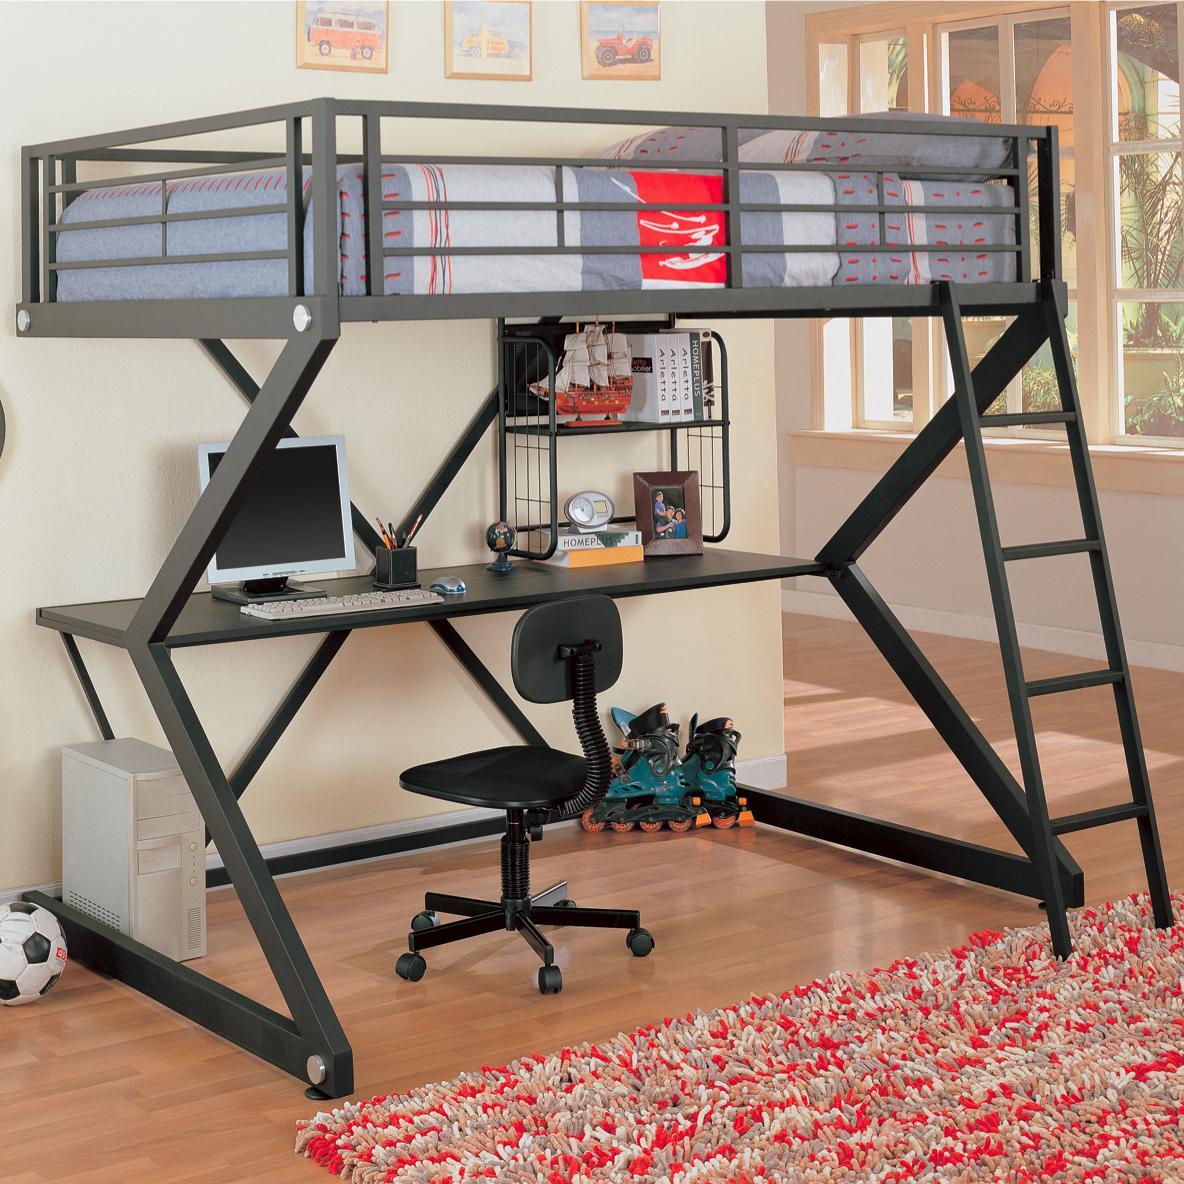 Bunks Workstation Loft Bed by Coaster at Value City Furniture